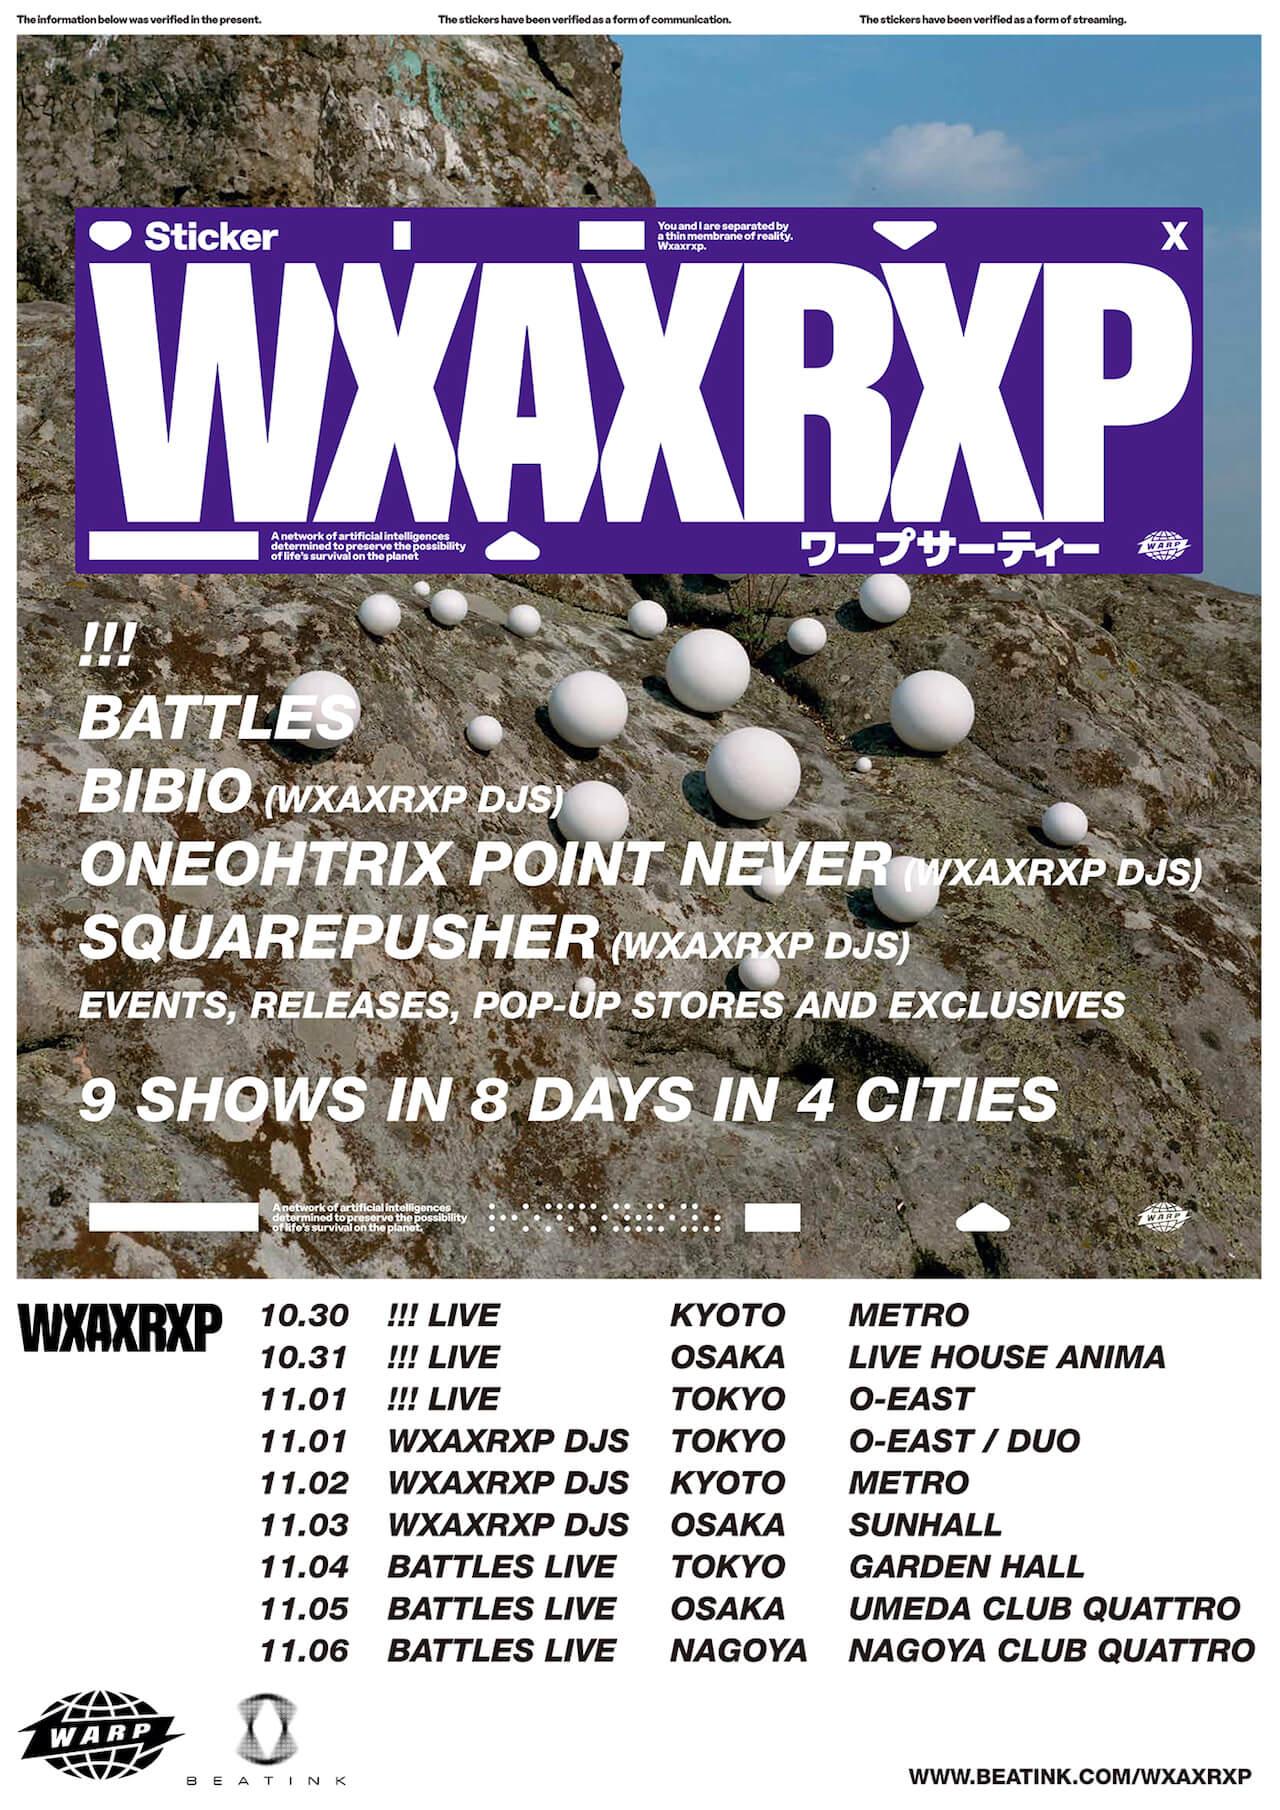 〈WARP〉から5曲セレクトするプレイリスト企画「MY WXAXRXP」第2弾に石若駿、in the blue shirt 有村 崚、江崎文武、片瀬那奈、Kenmochi Hidefumi、食品まつり a.k.a foodman、Dos Monosの7組が登場 music190912-warprecords